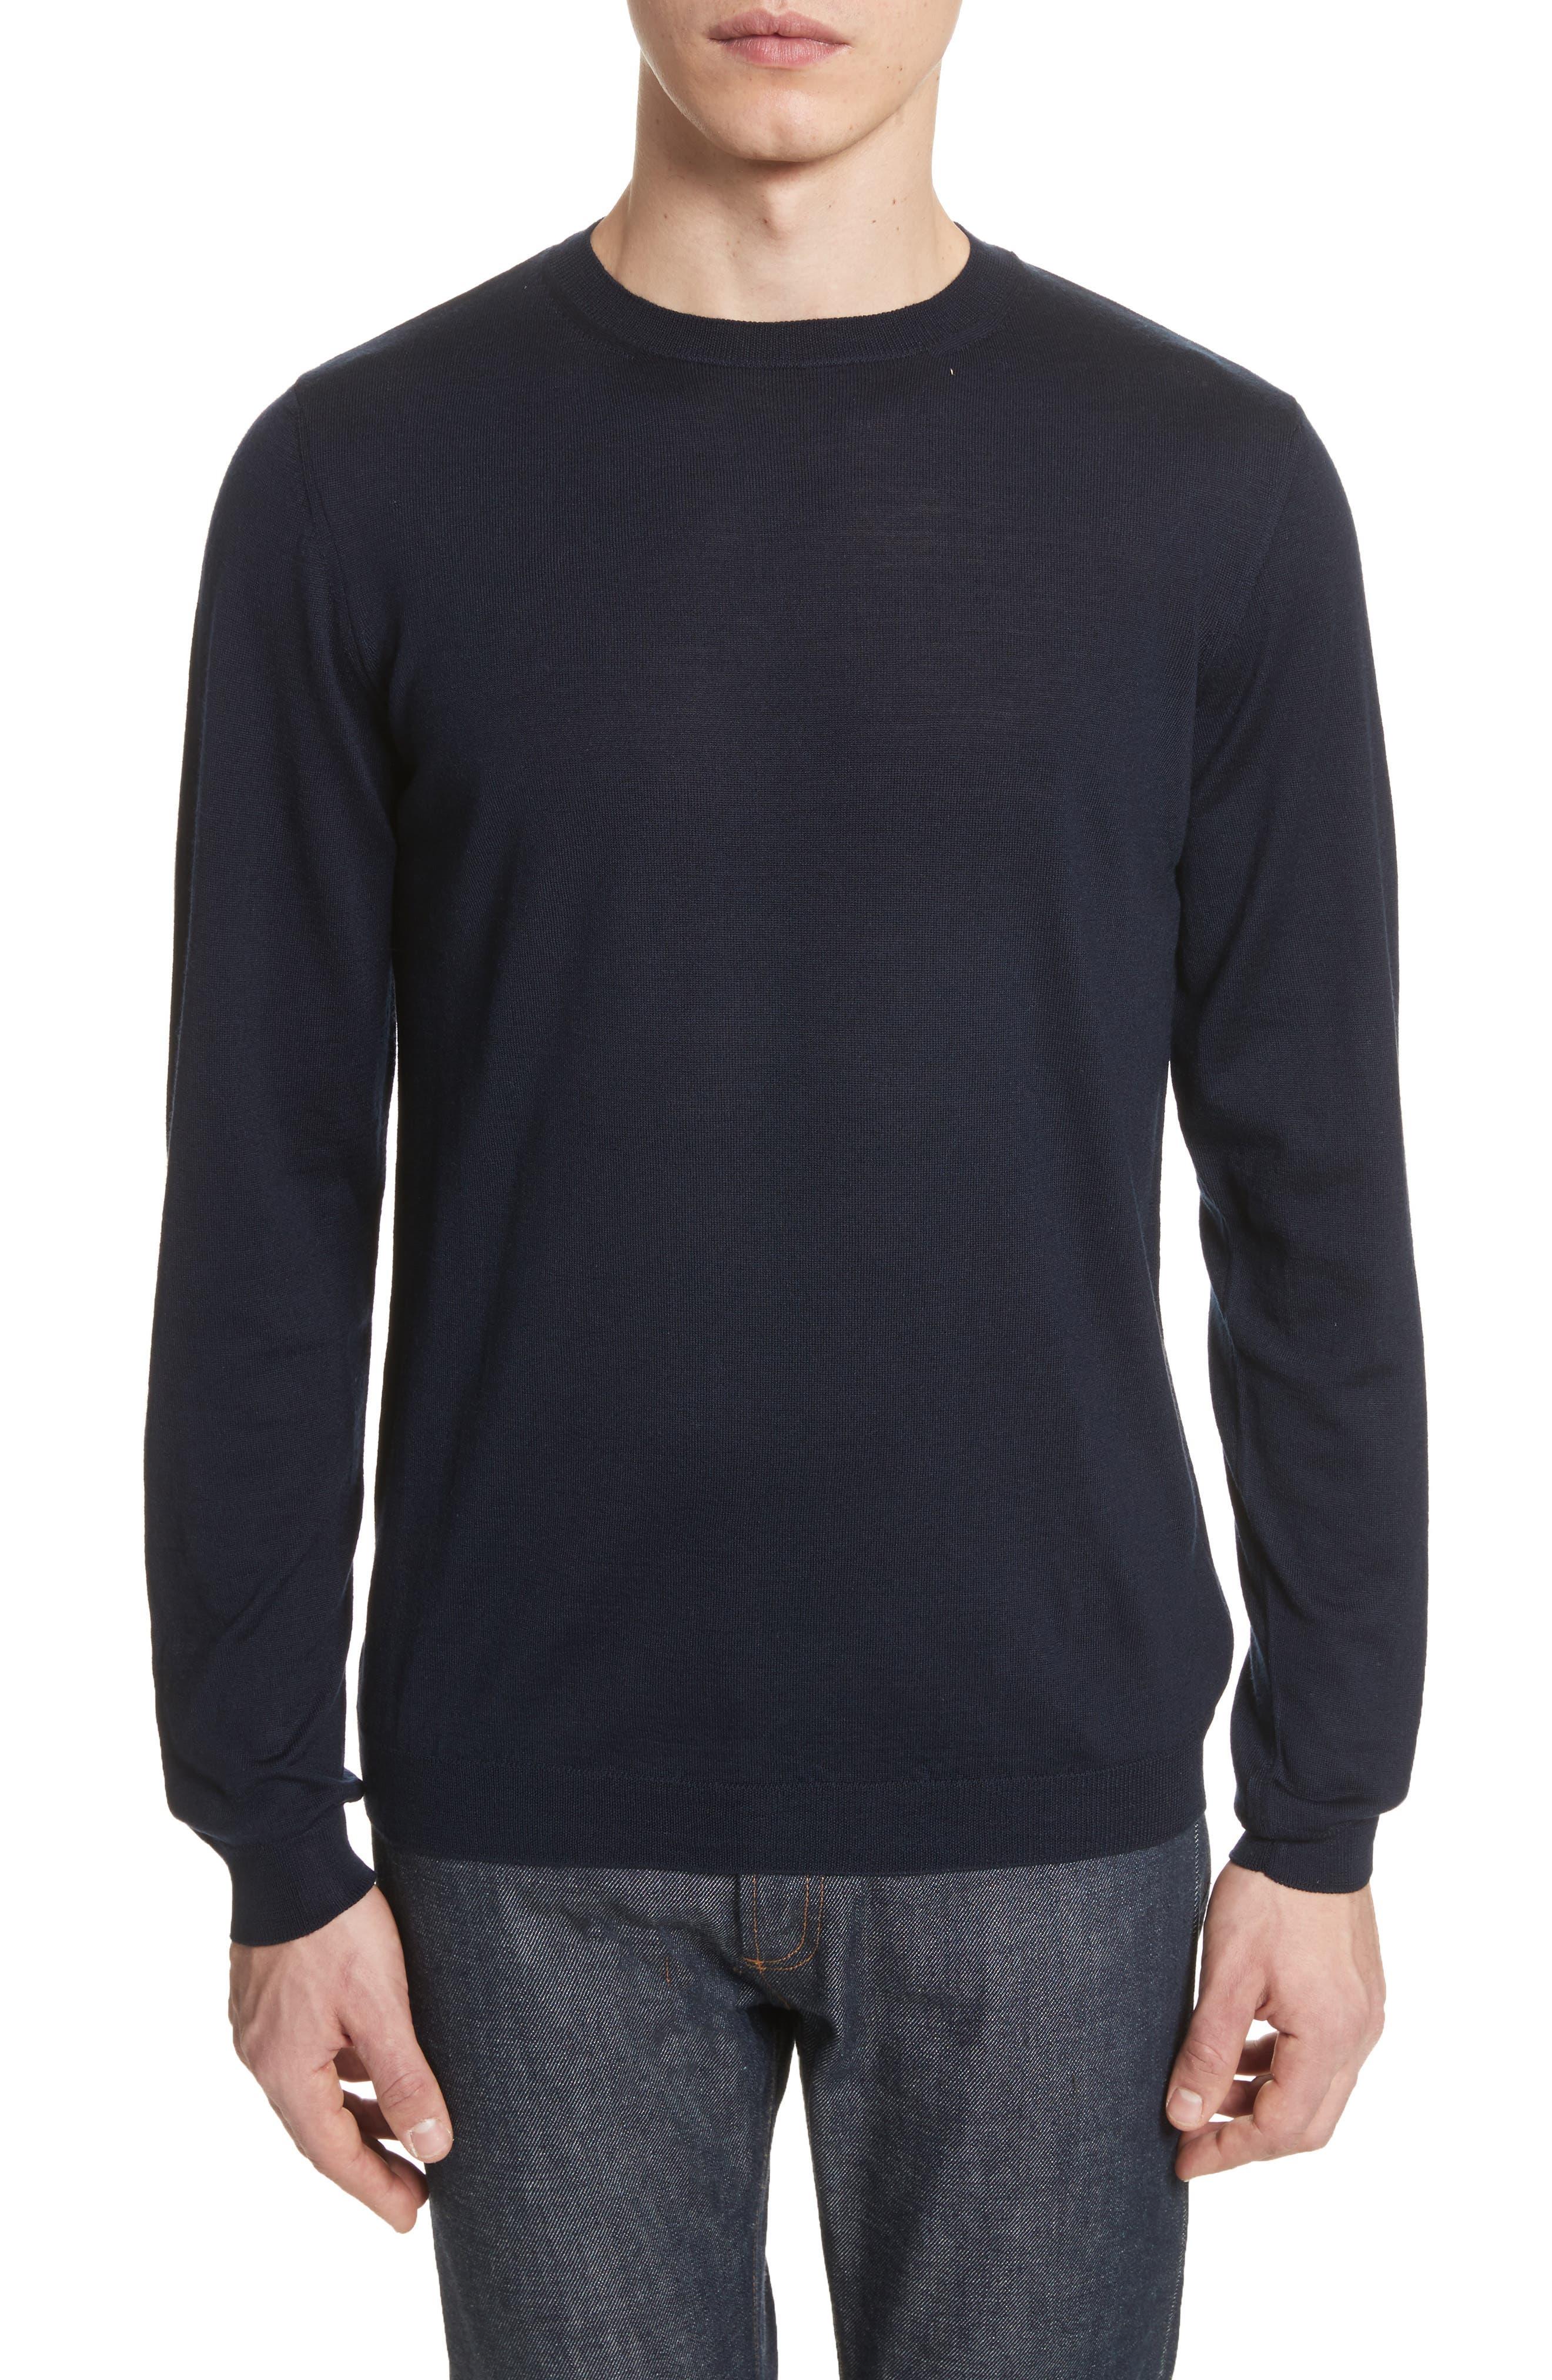 Sigfred Merino Wool & Silk Crewneck Sweater,                             Main thumbnail 1, color,                             Dark Navy